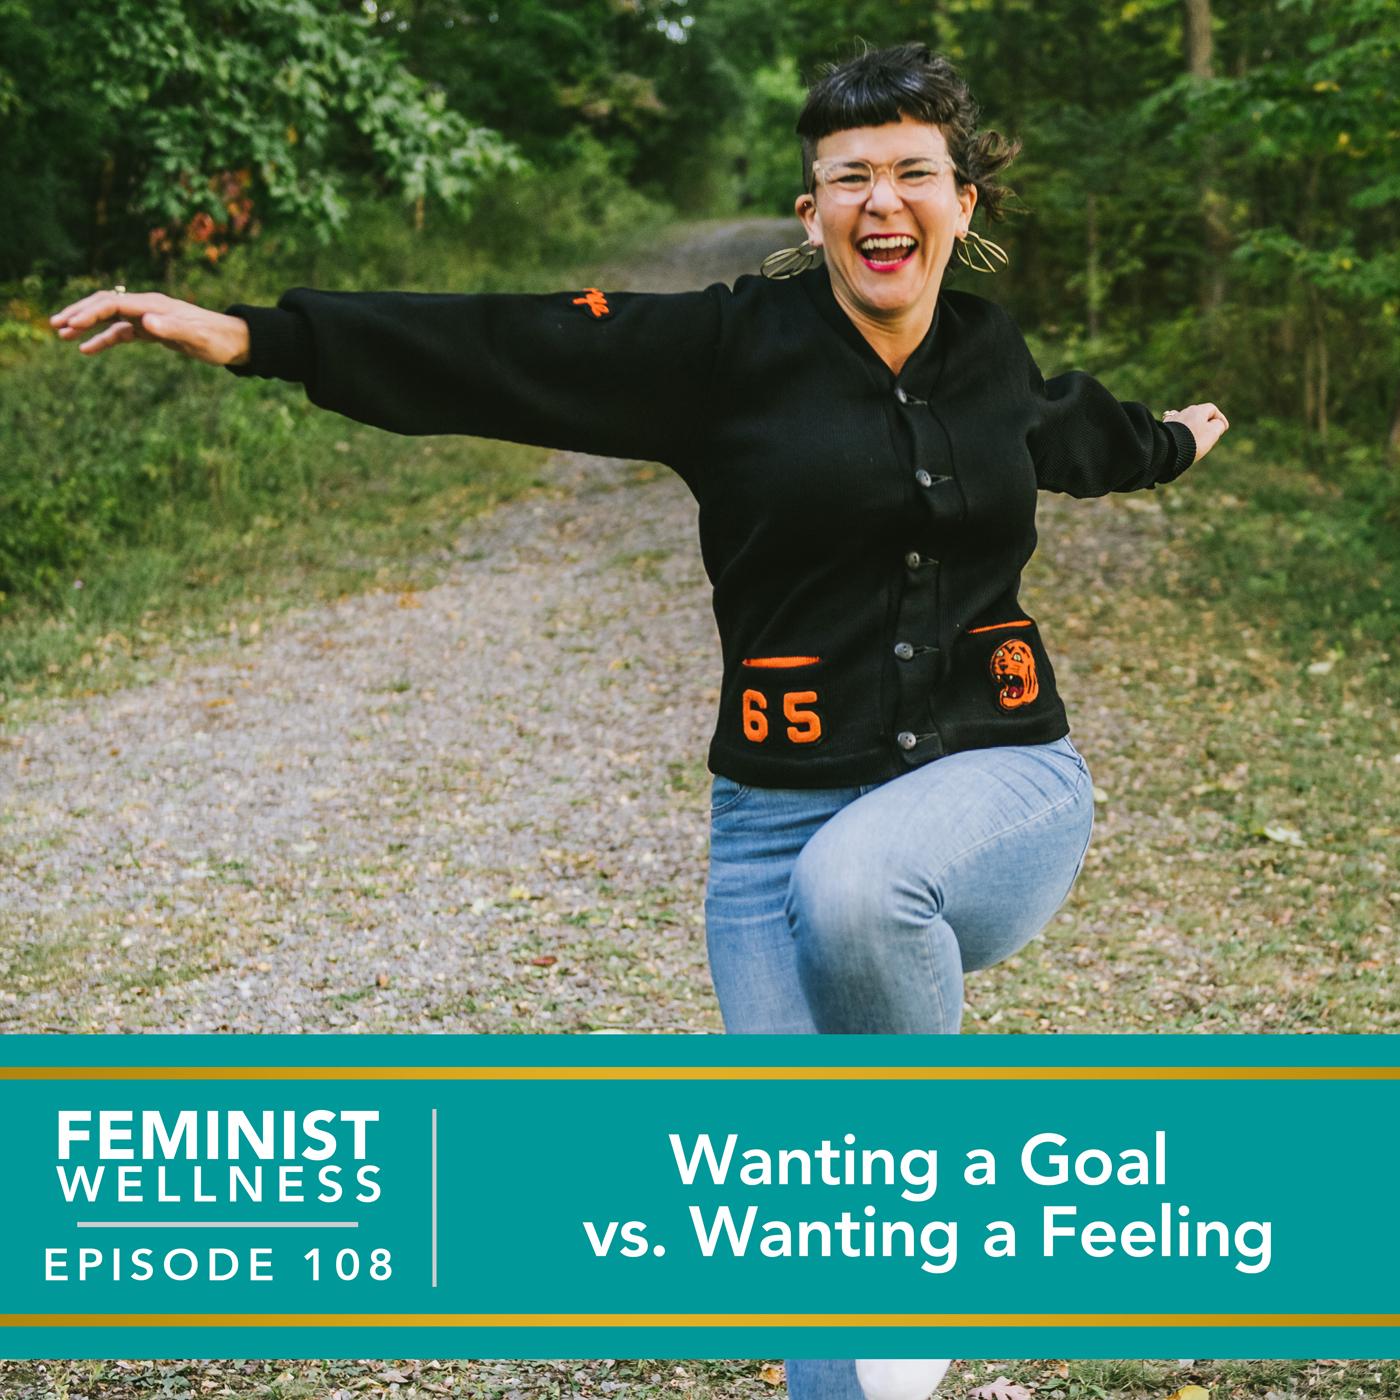 Wanting a Goal vs. Wanting a Feeling